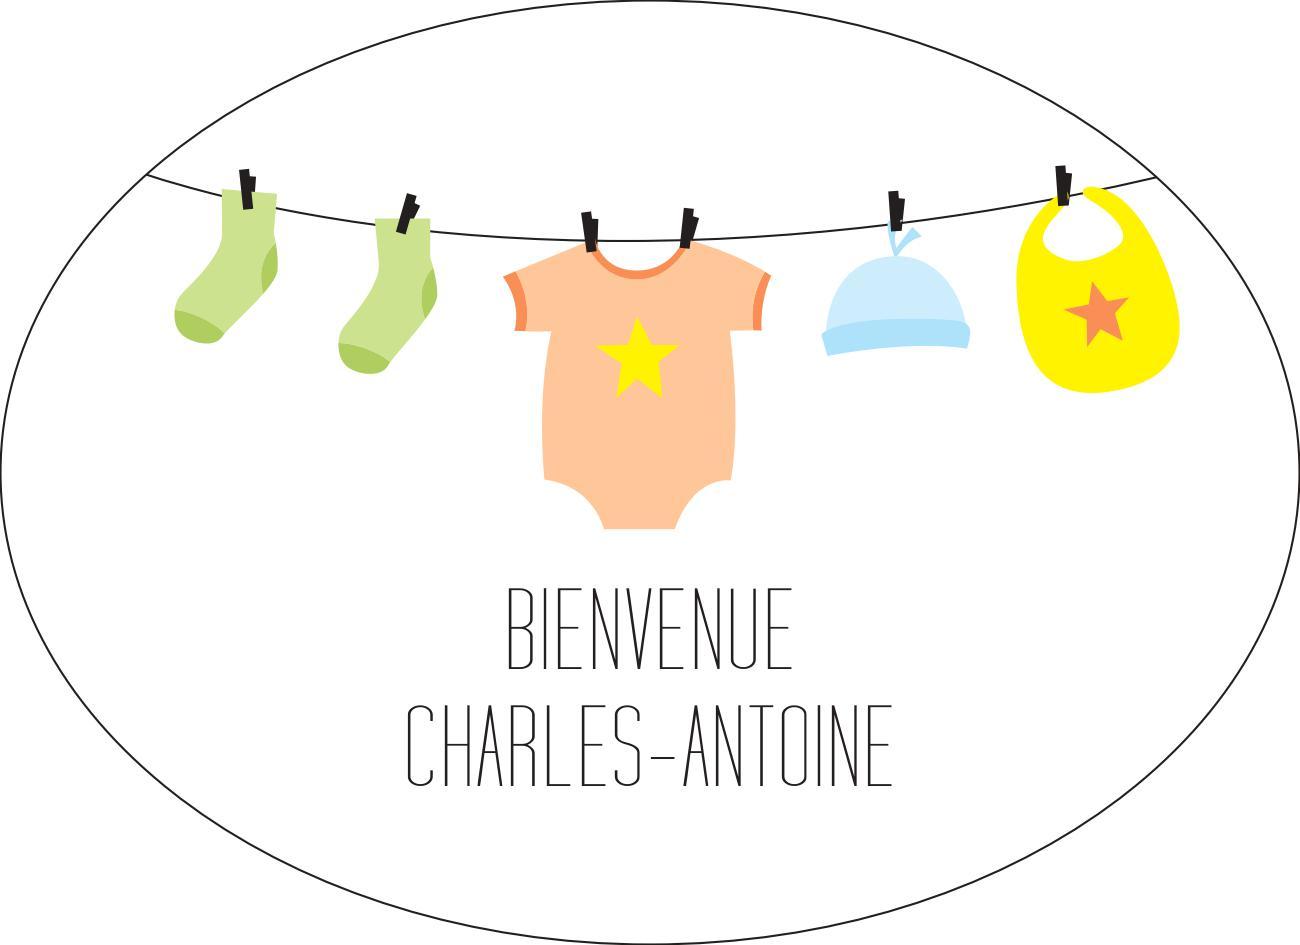 birth-charles-antoine_has-image